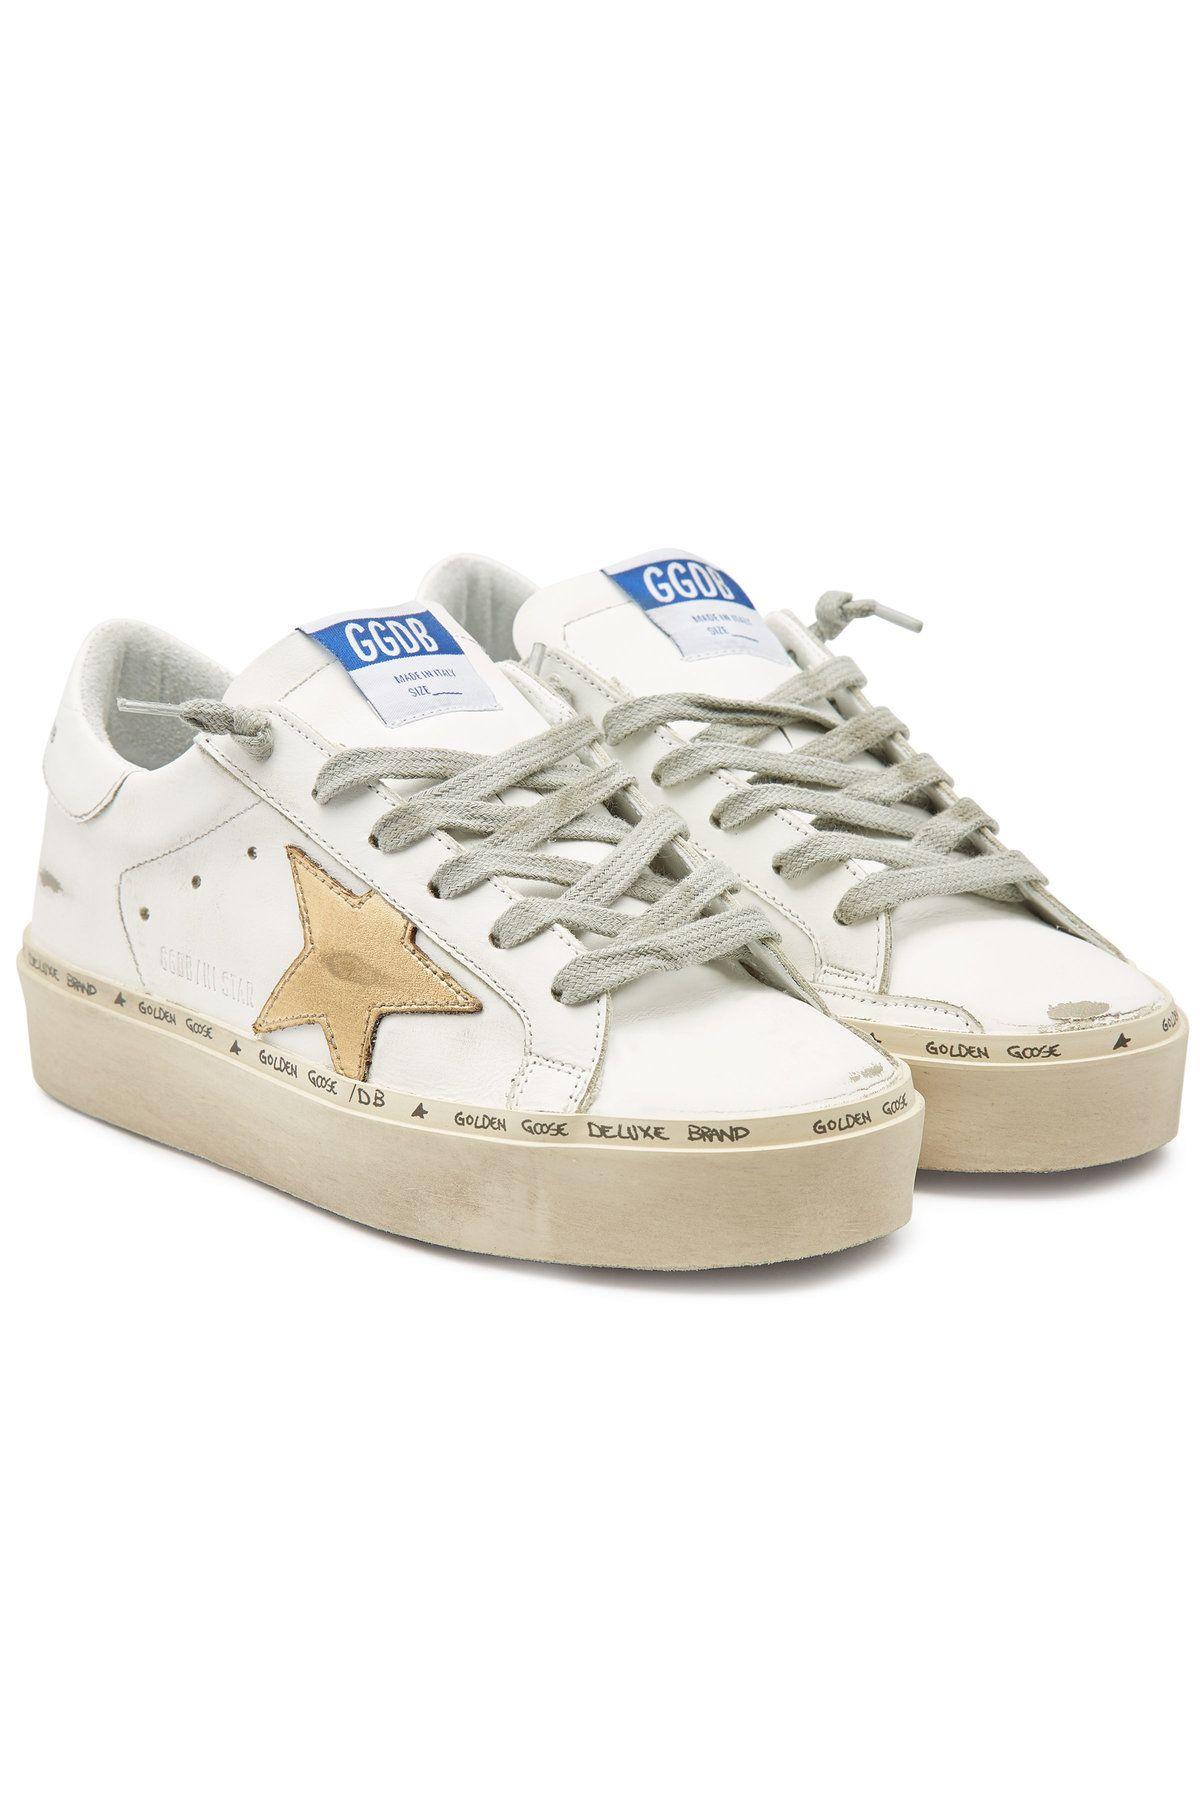 43d7cd433aa53 Golden Goose Deluxe Brand - Hi Star Leather Platform Sneakers on  STYLEBOP.com